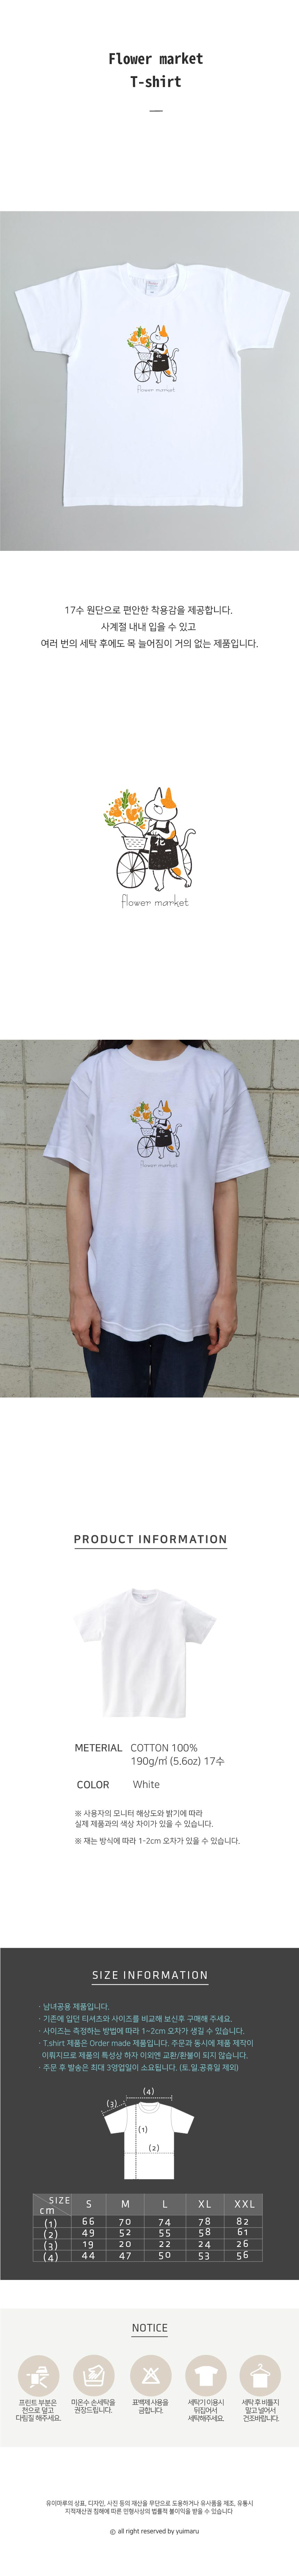 Flower market T-shirt - 유이마루, 22,500원, 상의, 반팔티셔츠